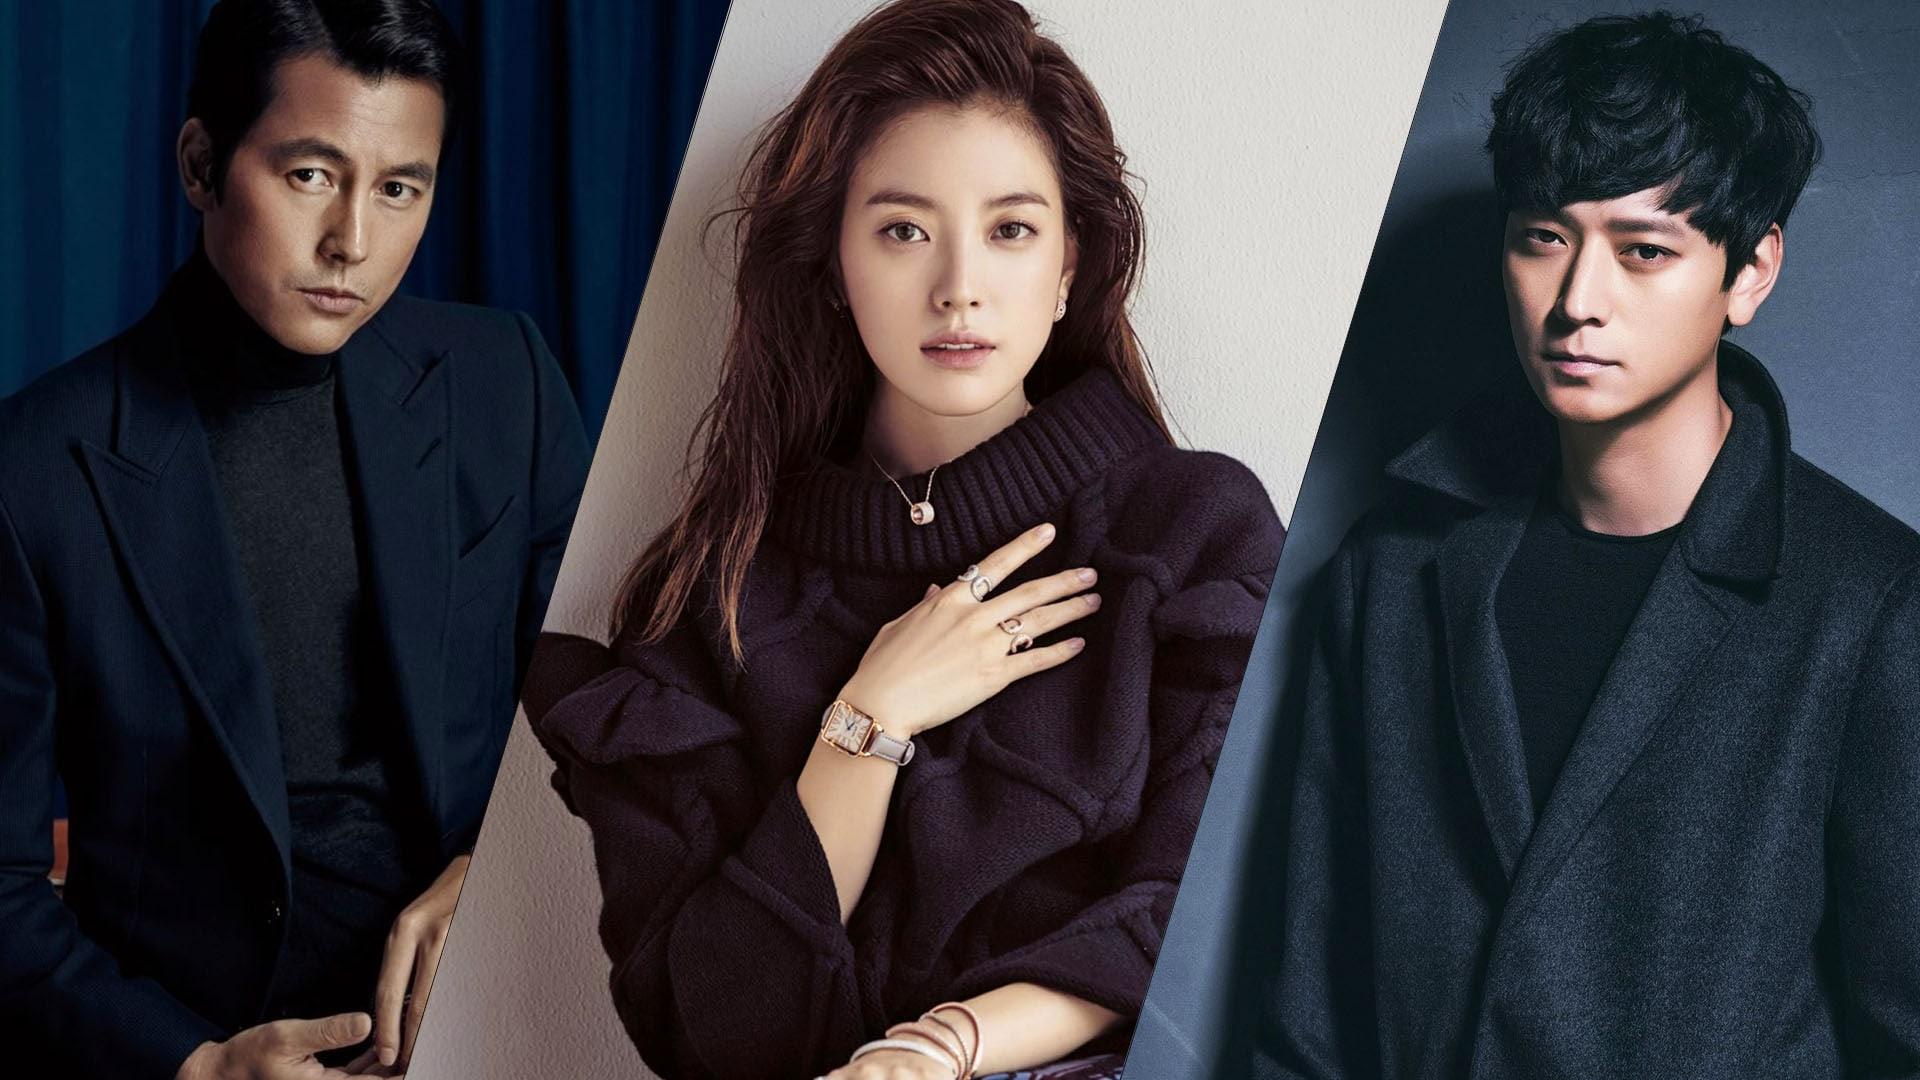 Han Hyo Joo, Kang Dong Won, And Jung Woo Sung To Potentially Star In New Movie Together